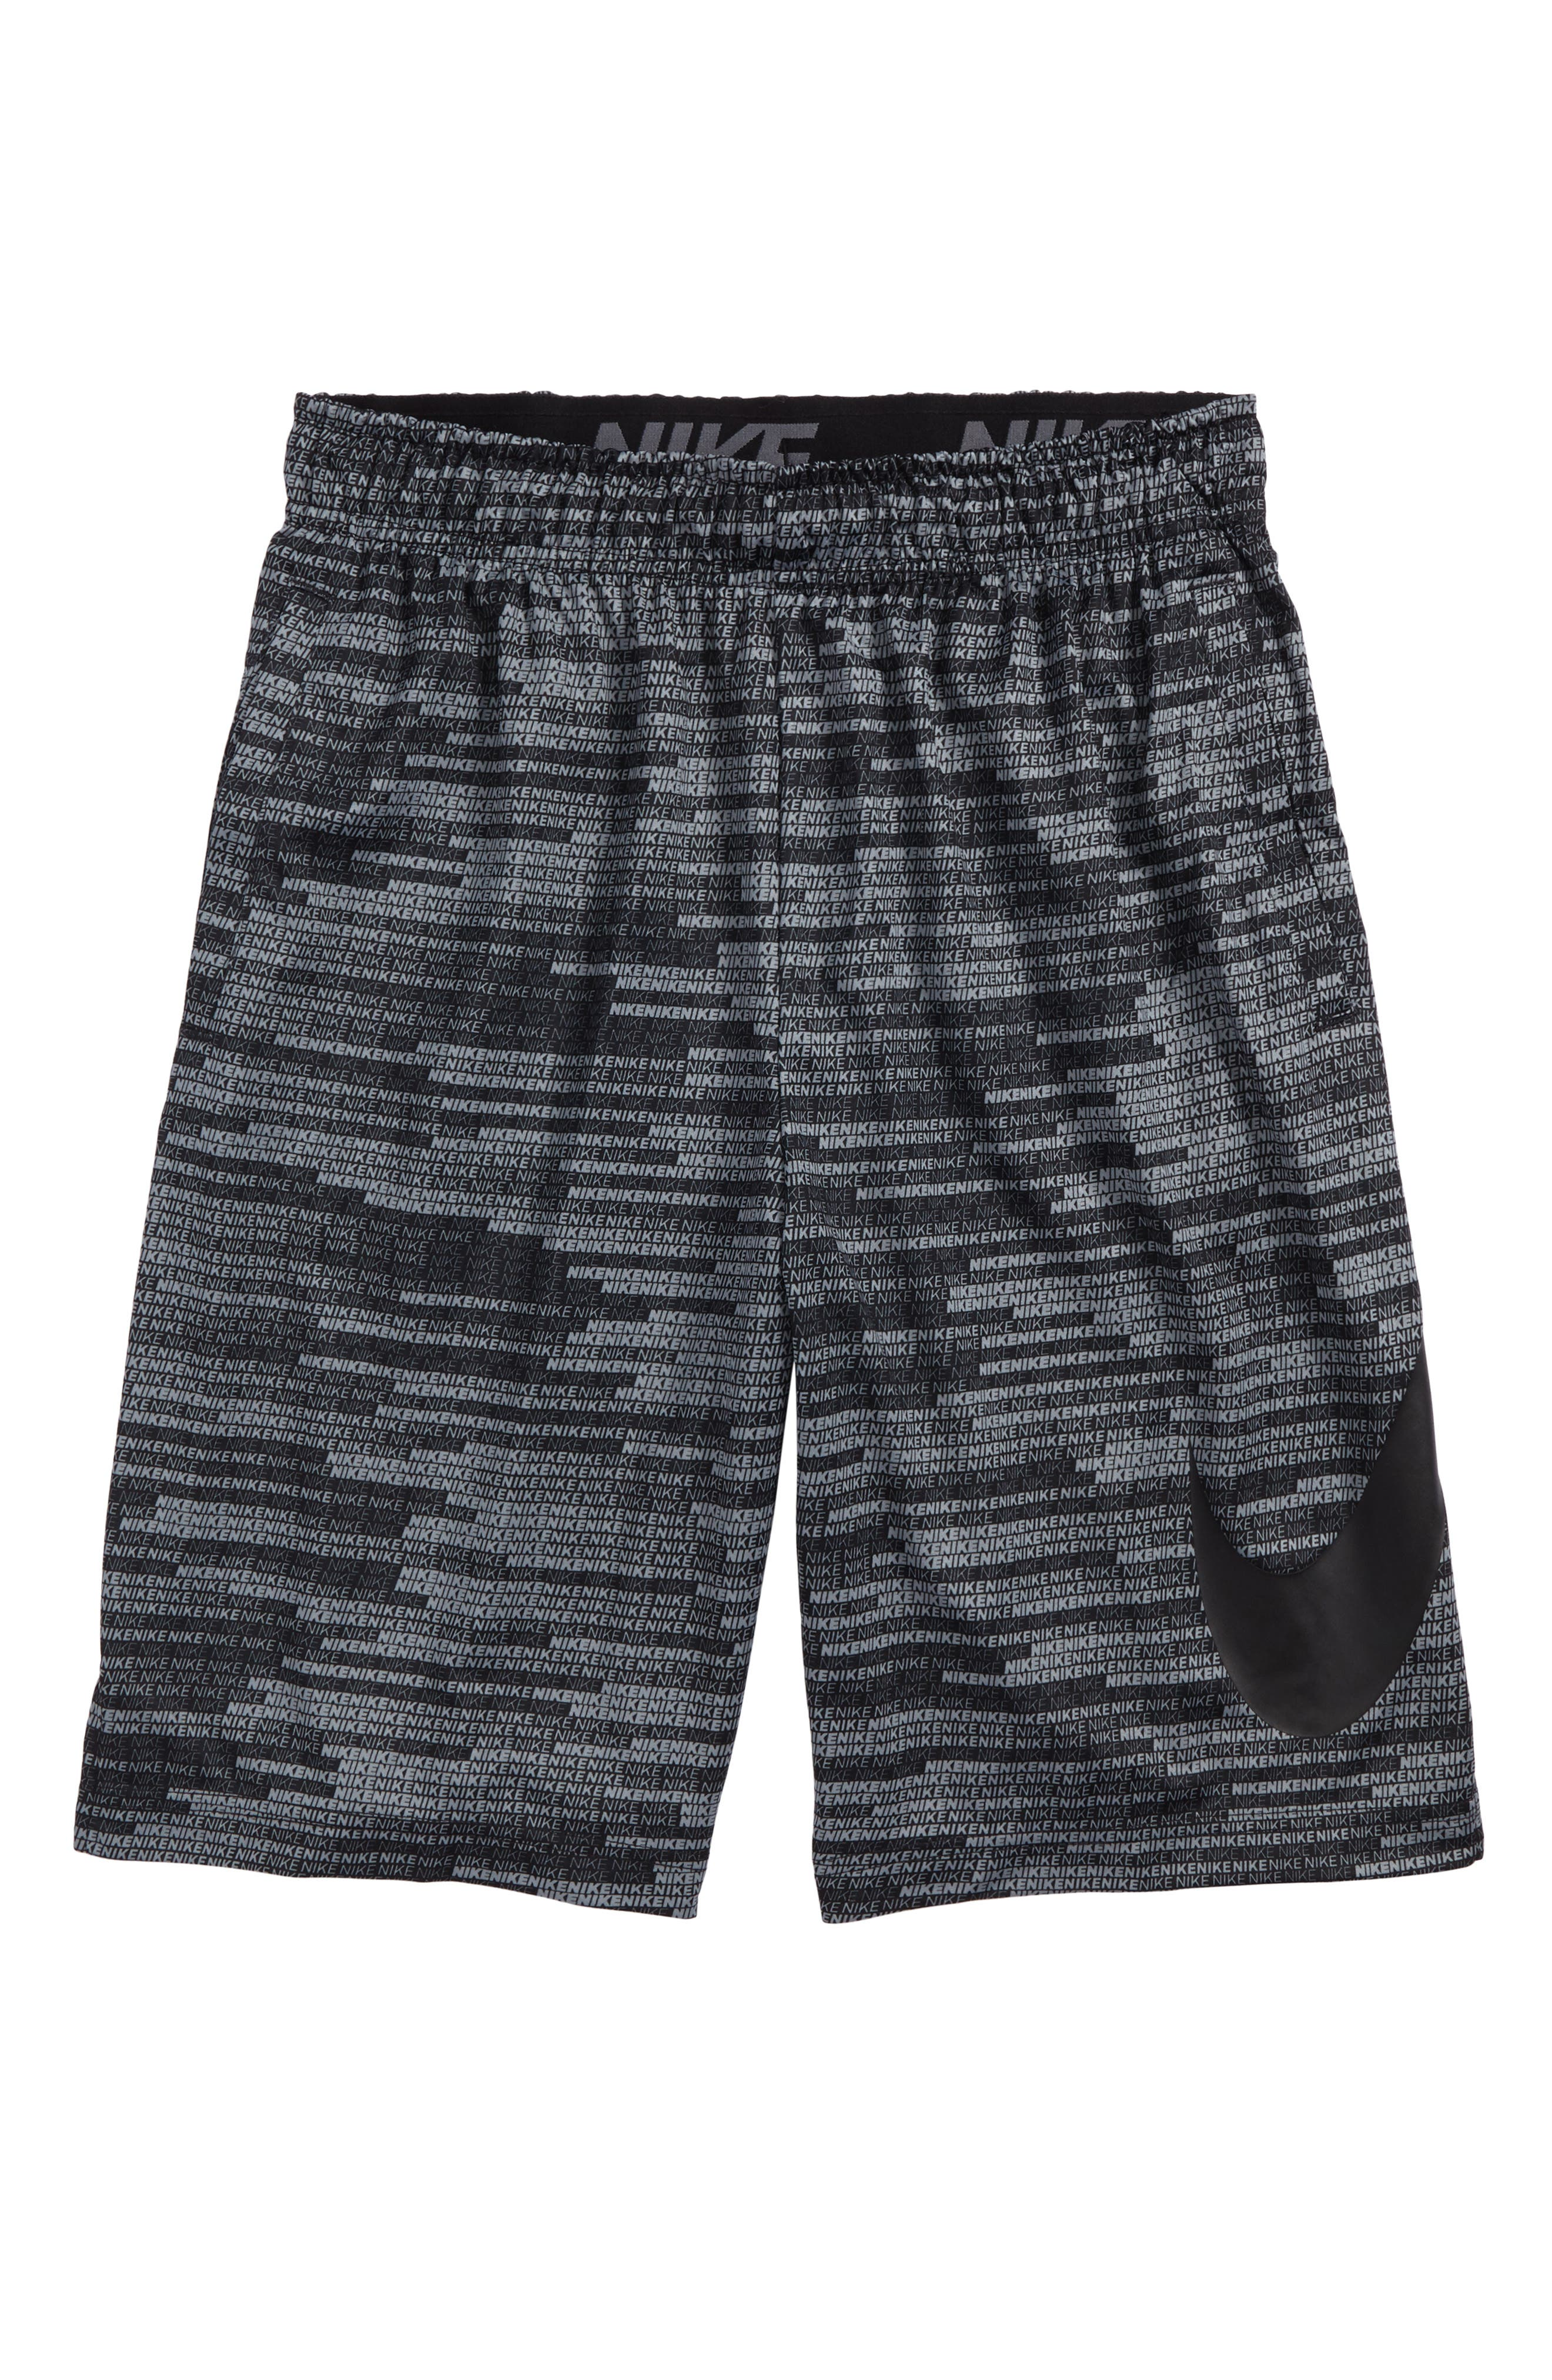 Dry Training Shorts,                             Main thumbnail 1, color,                             010